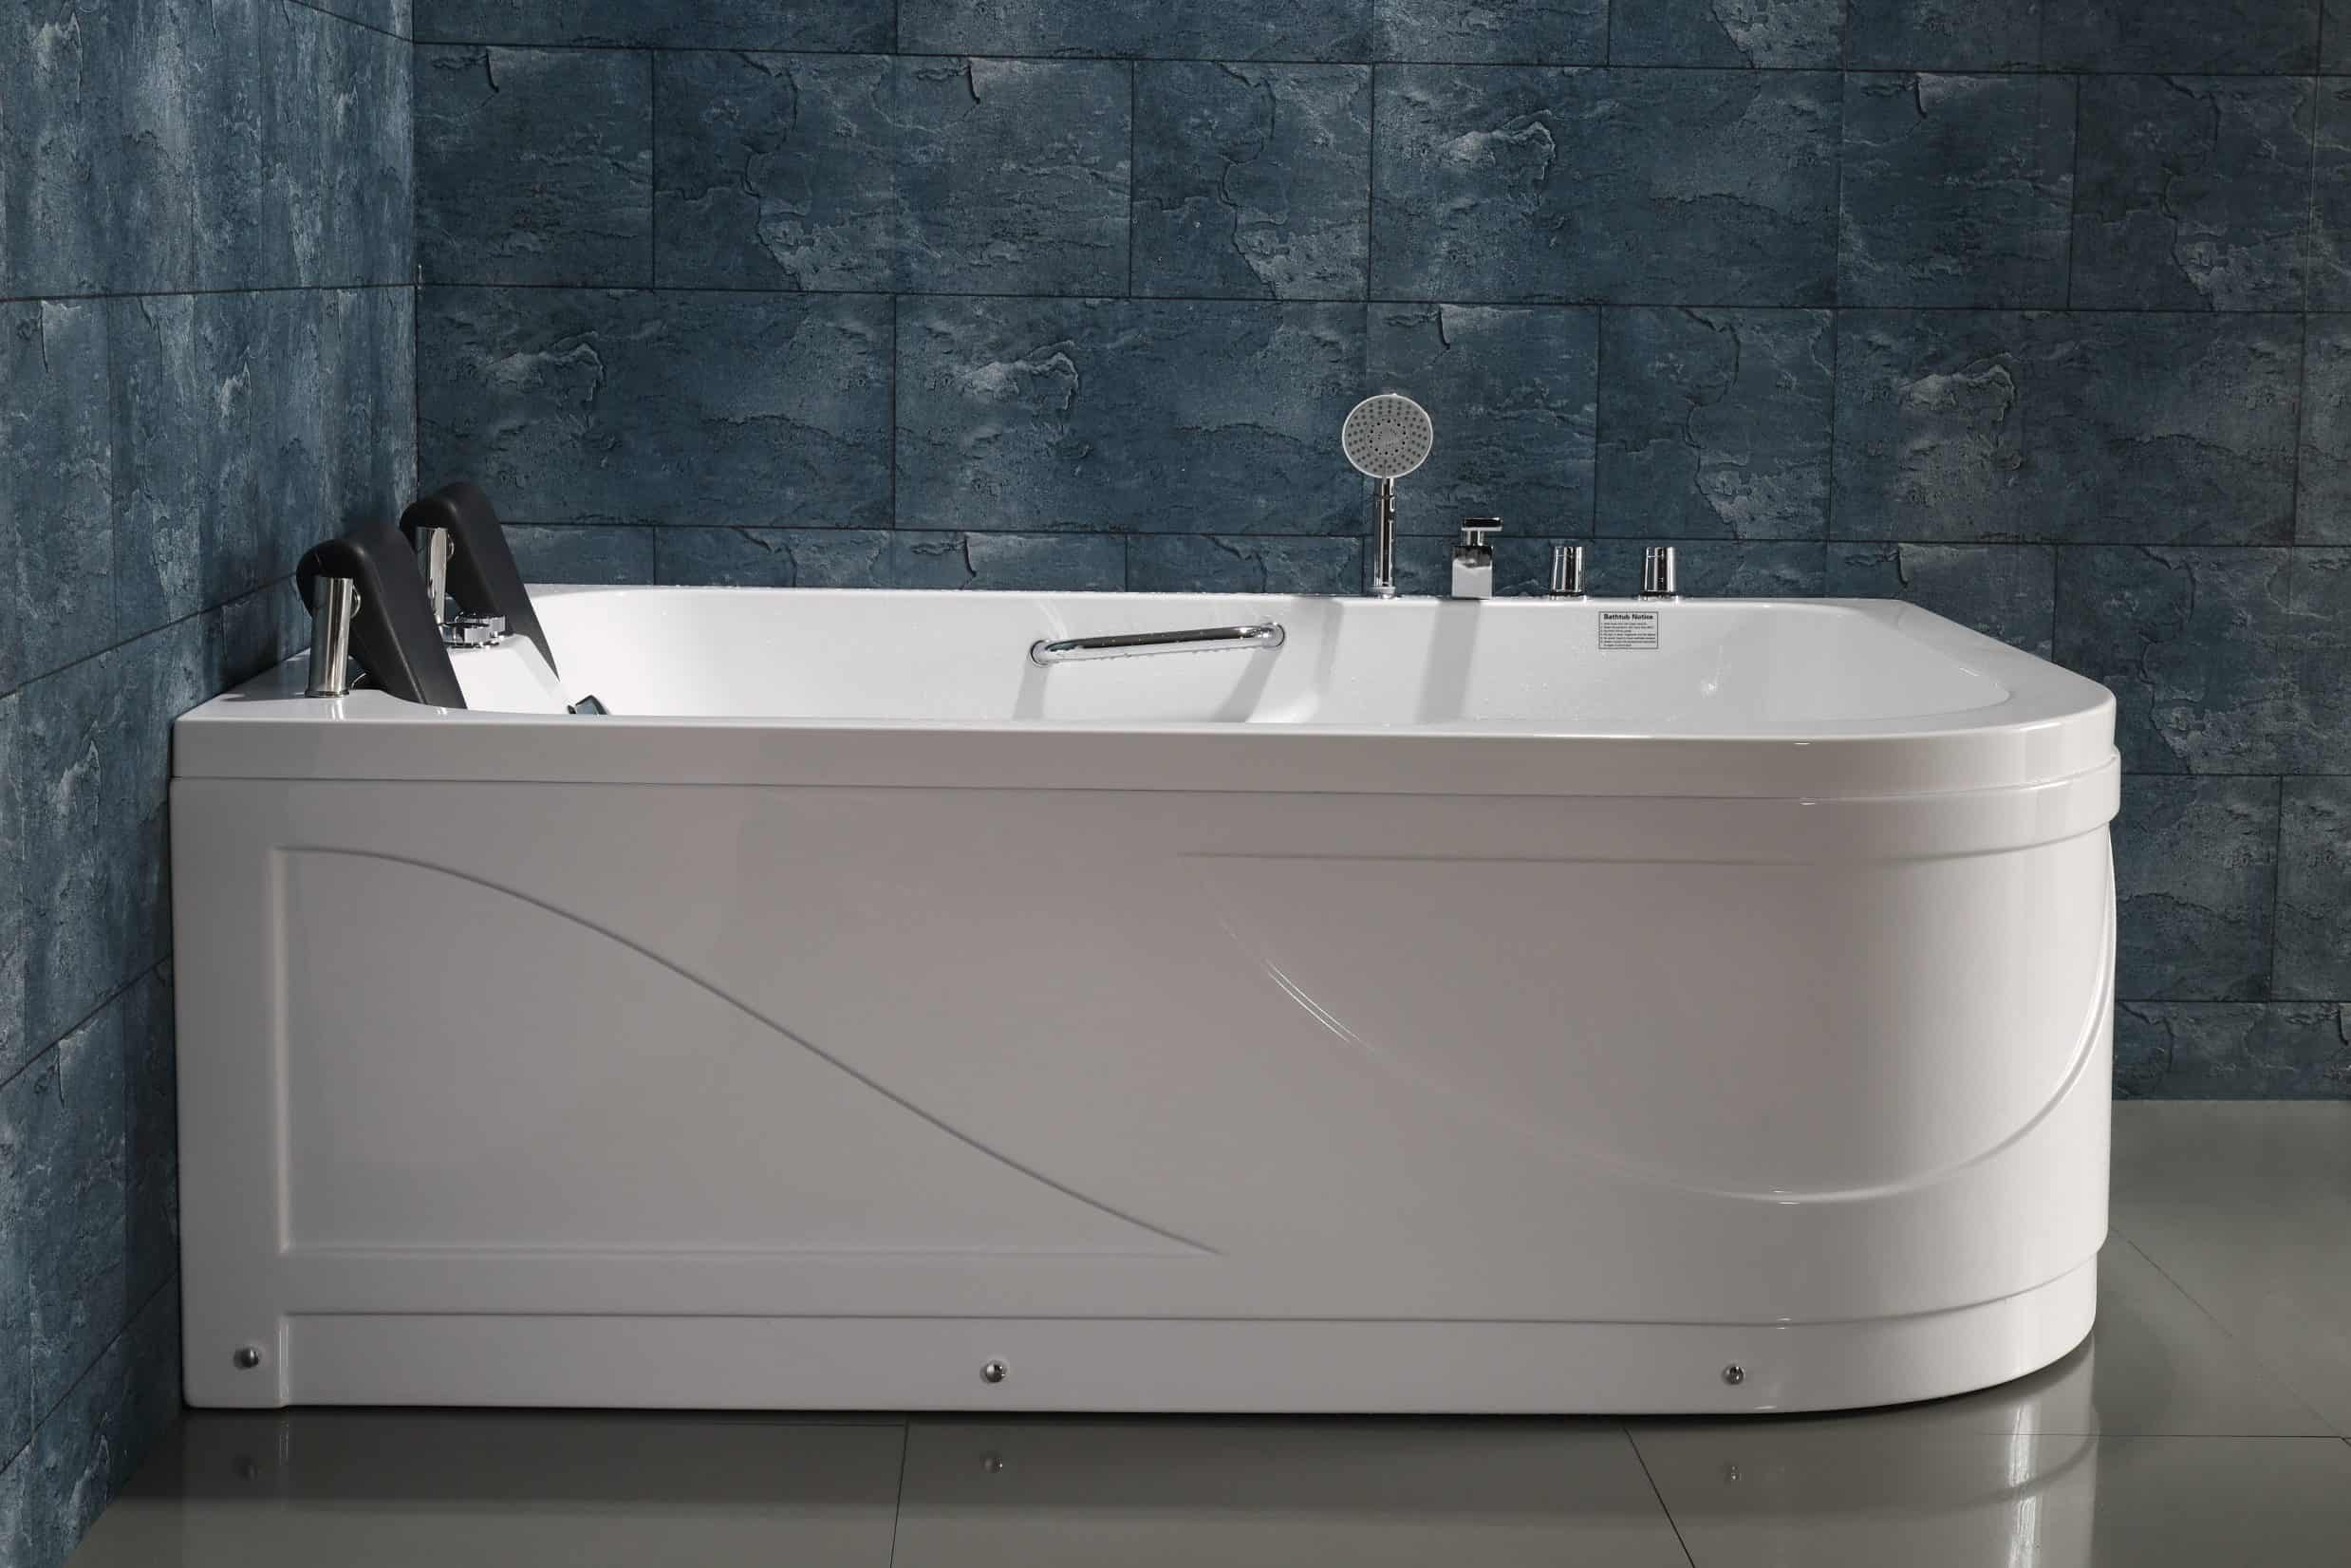 Sorrento Bath Side View